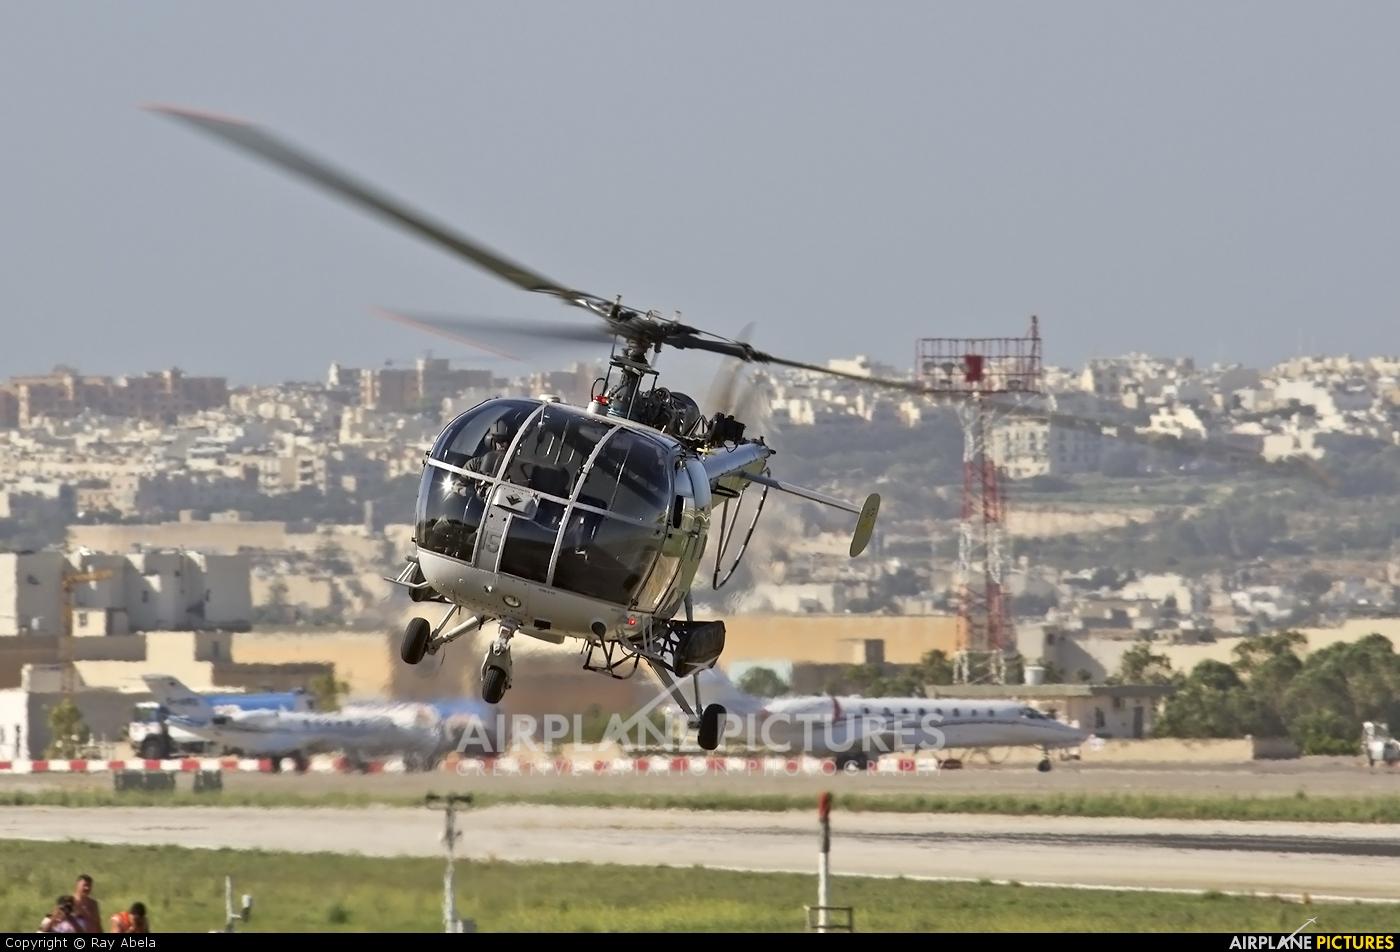 Malta - Armed Forces AS9315 aircraft at Malta Intl